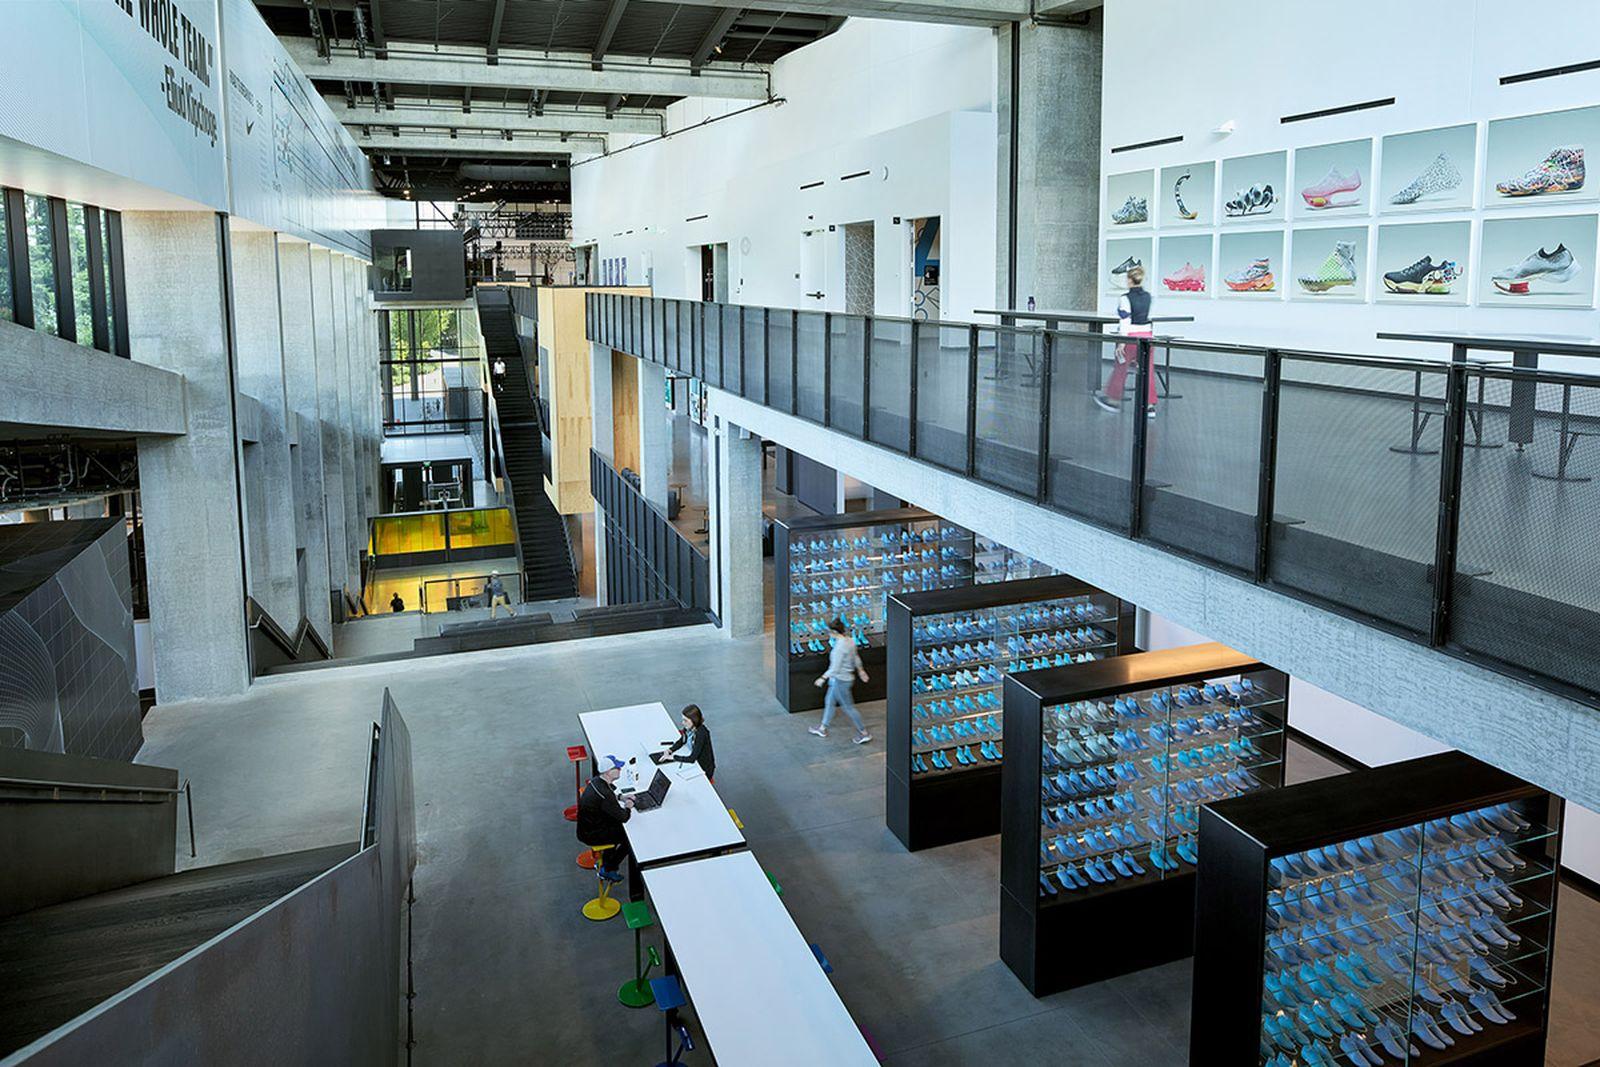 nike-lebron-james-innovation-center- (15)